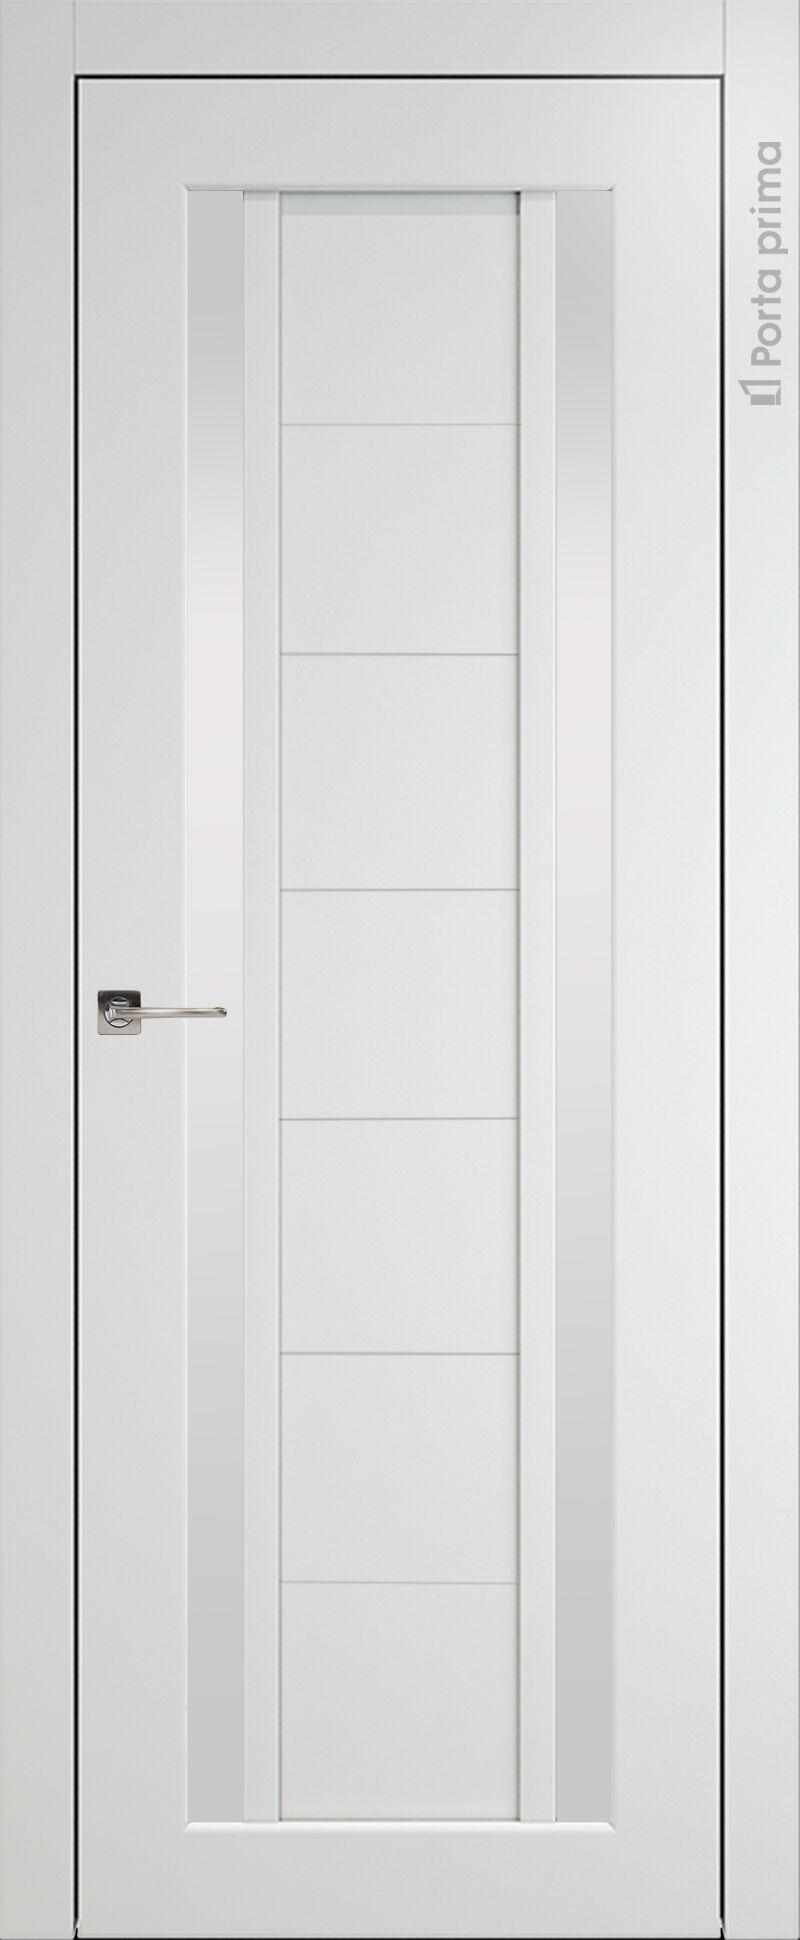 Palazzo цвет - Белая эмаль (RAL 9003) Без стекла (ДГ)